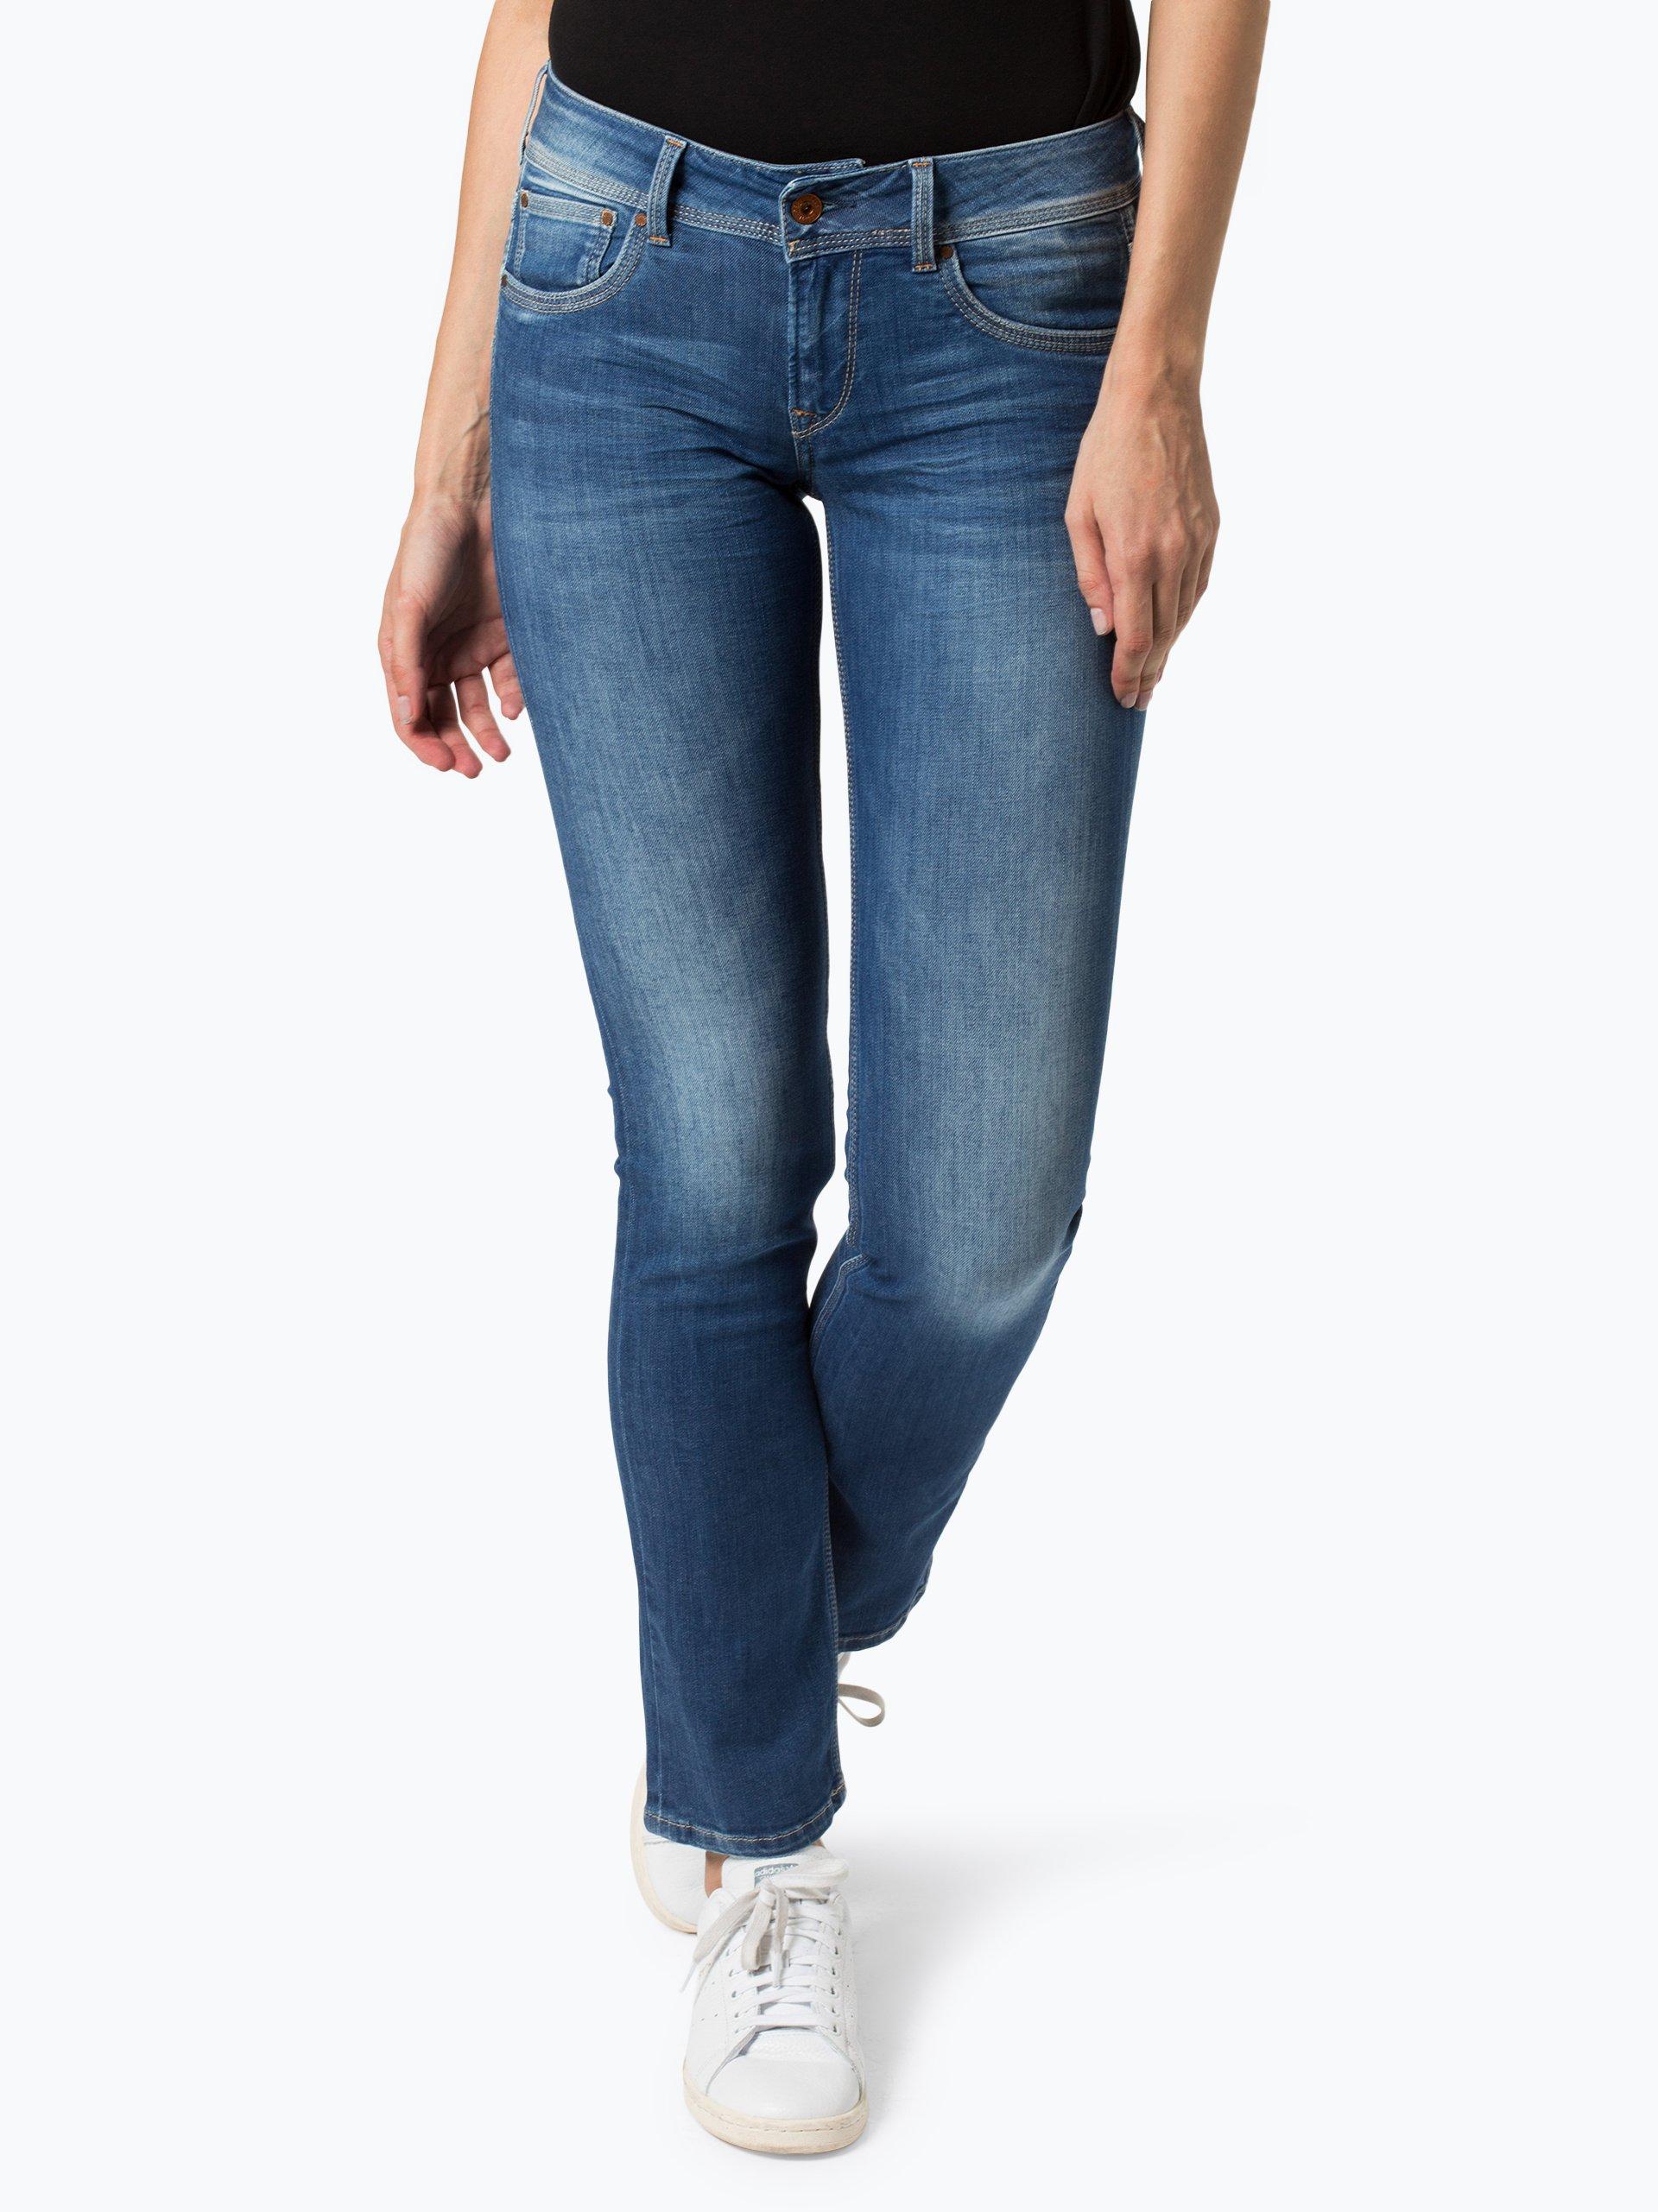 Pepe Jeans Damen Jeans - Saturn